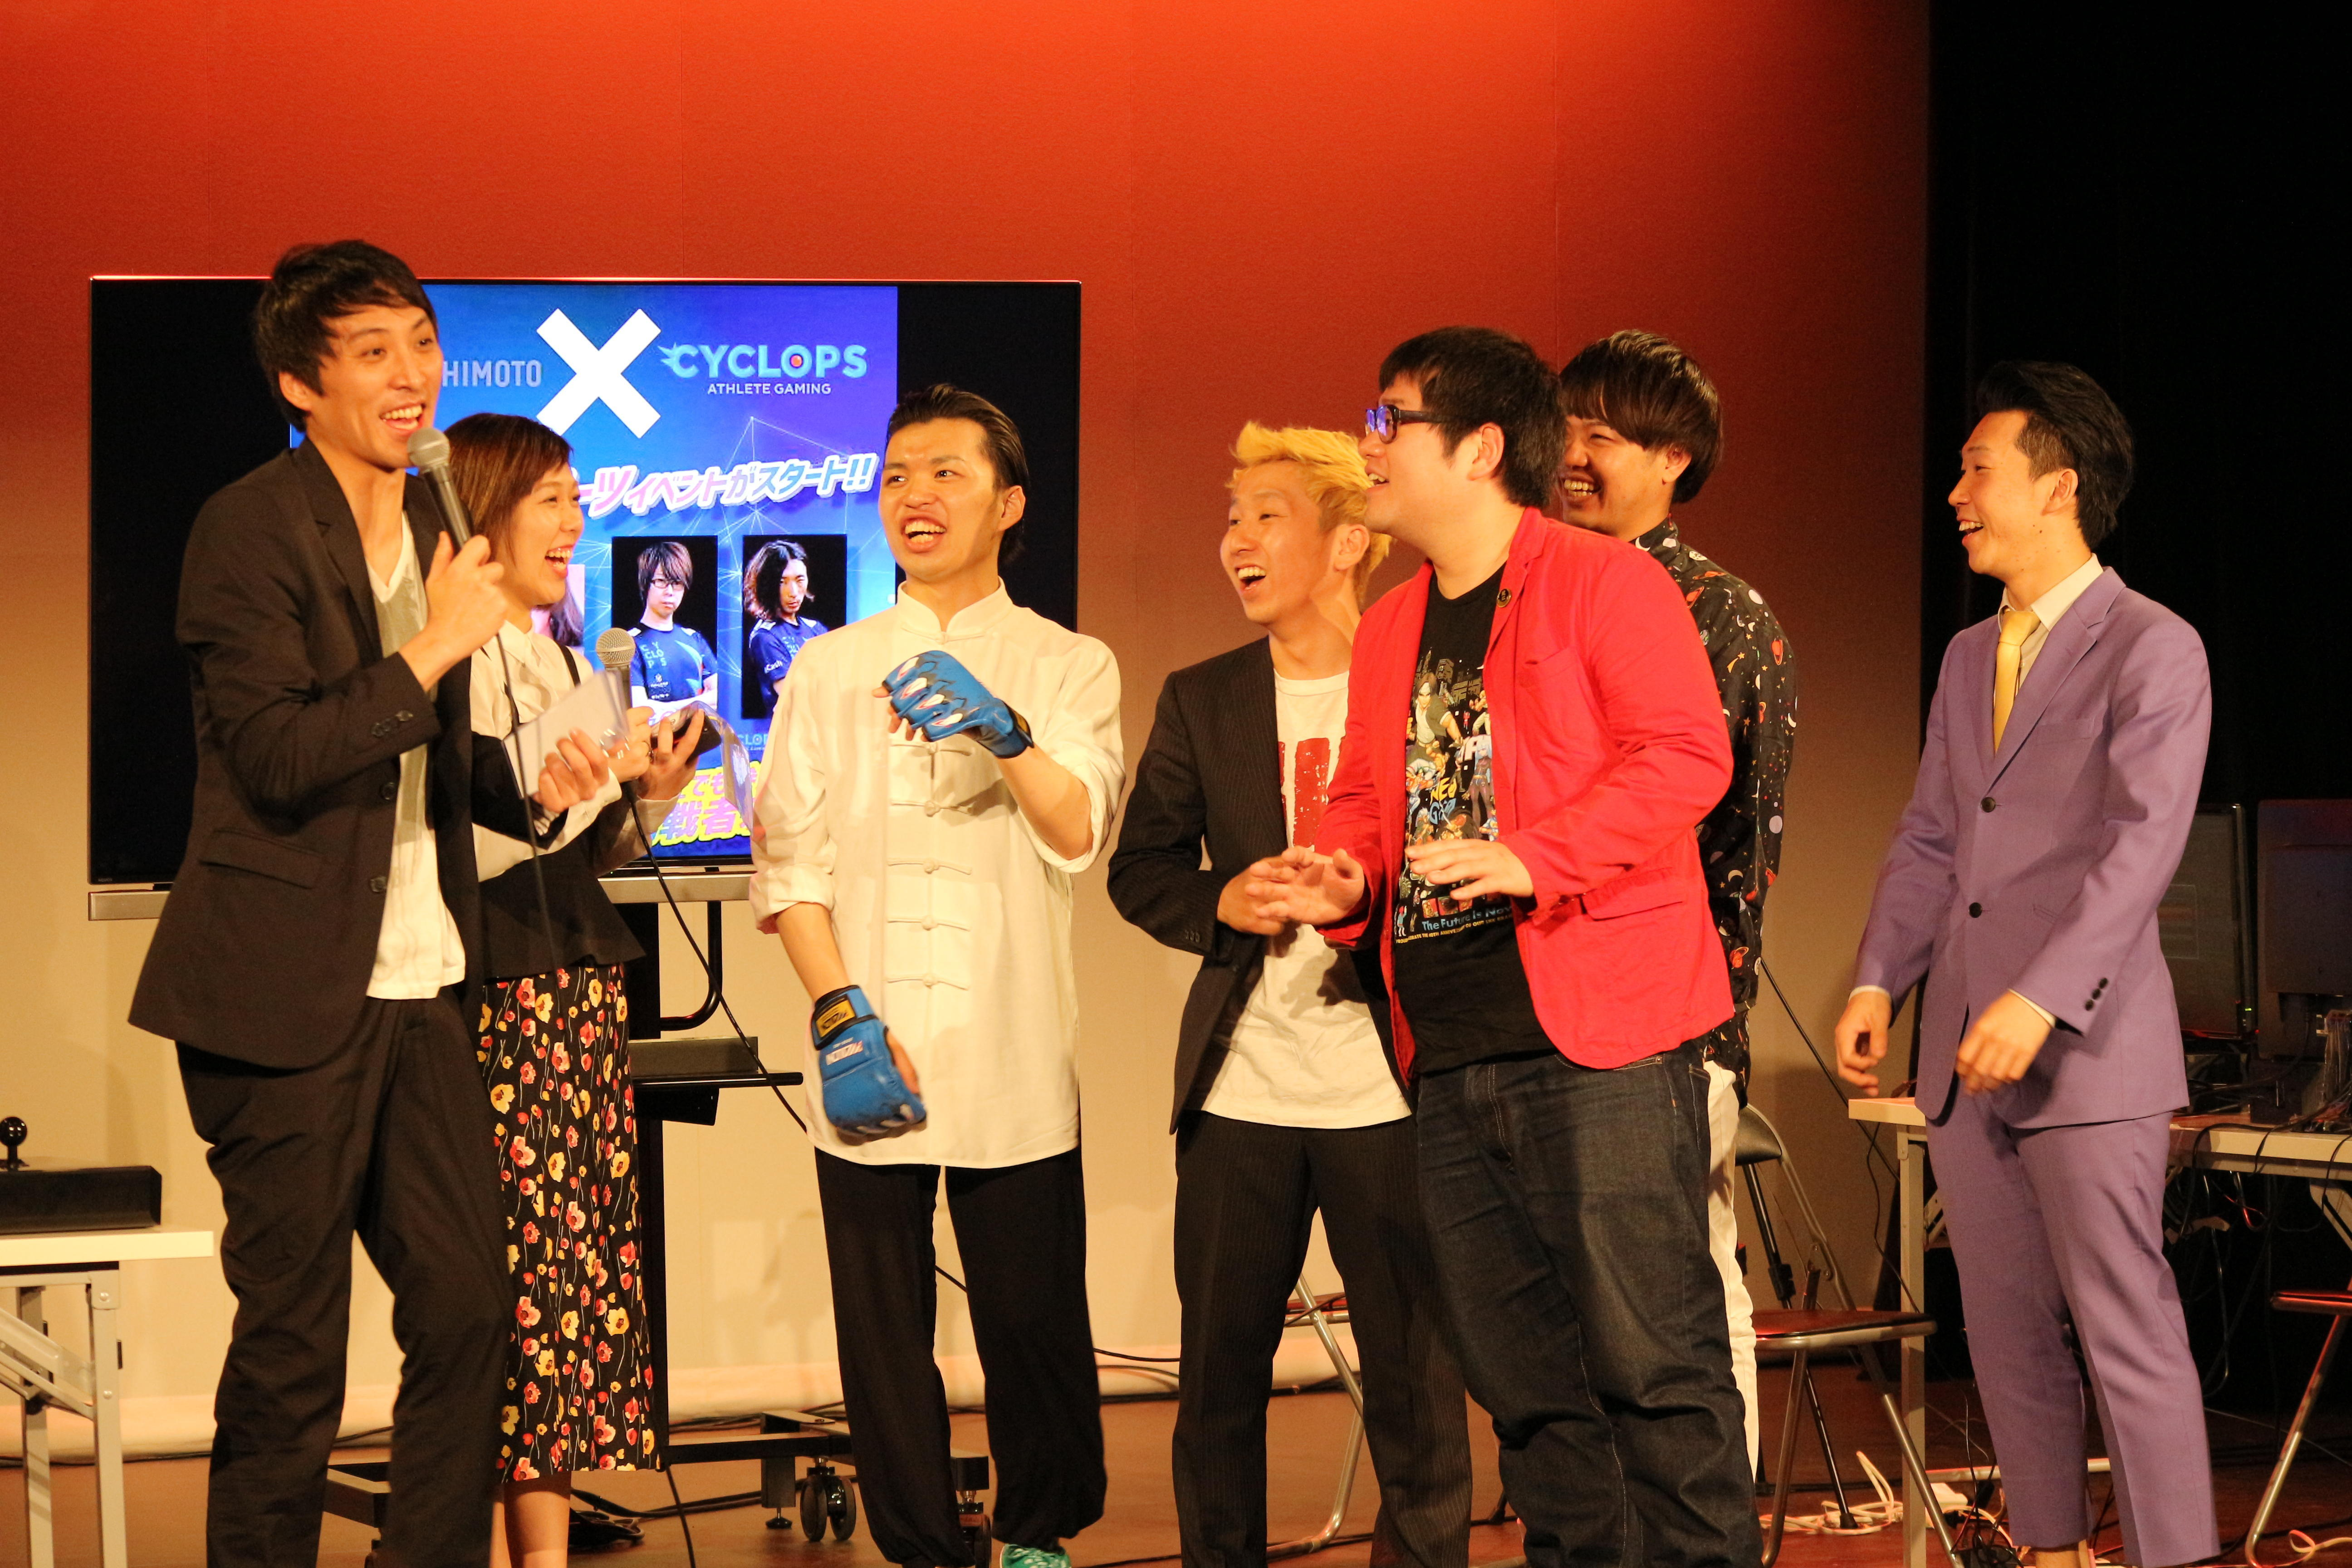 http://news.yoshimoto.co.jp/20180429234704-65ad61c7dda7a989191d927ce197a59076d28f2c.jpg